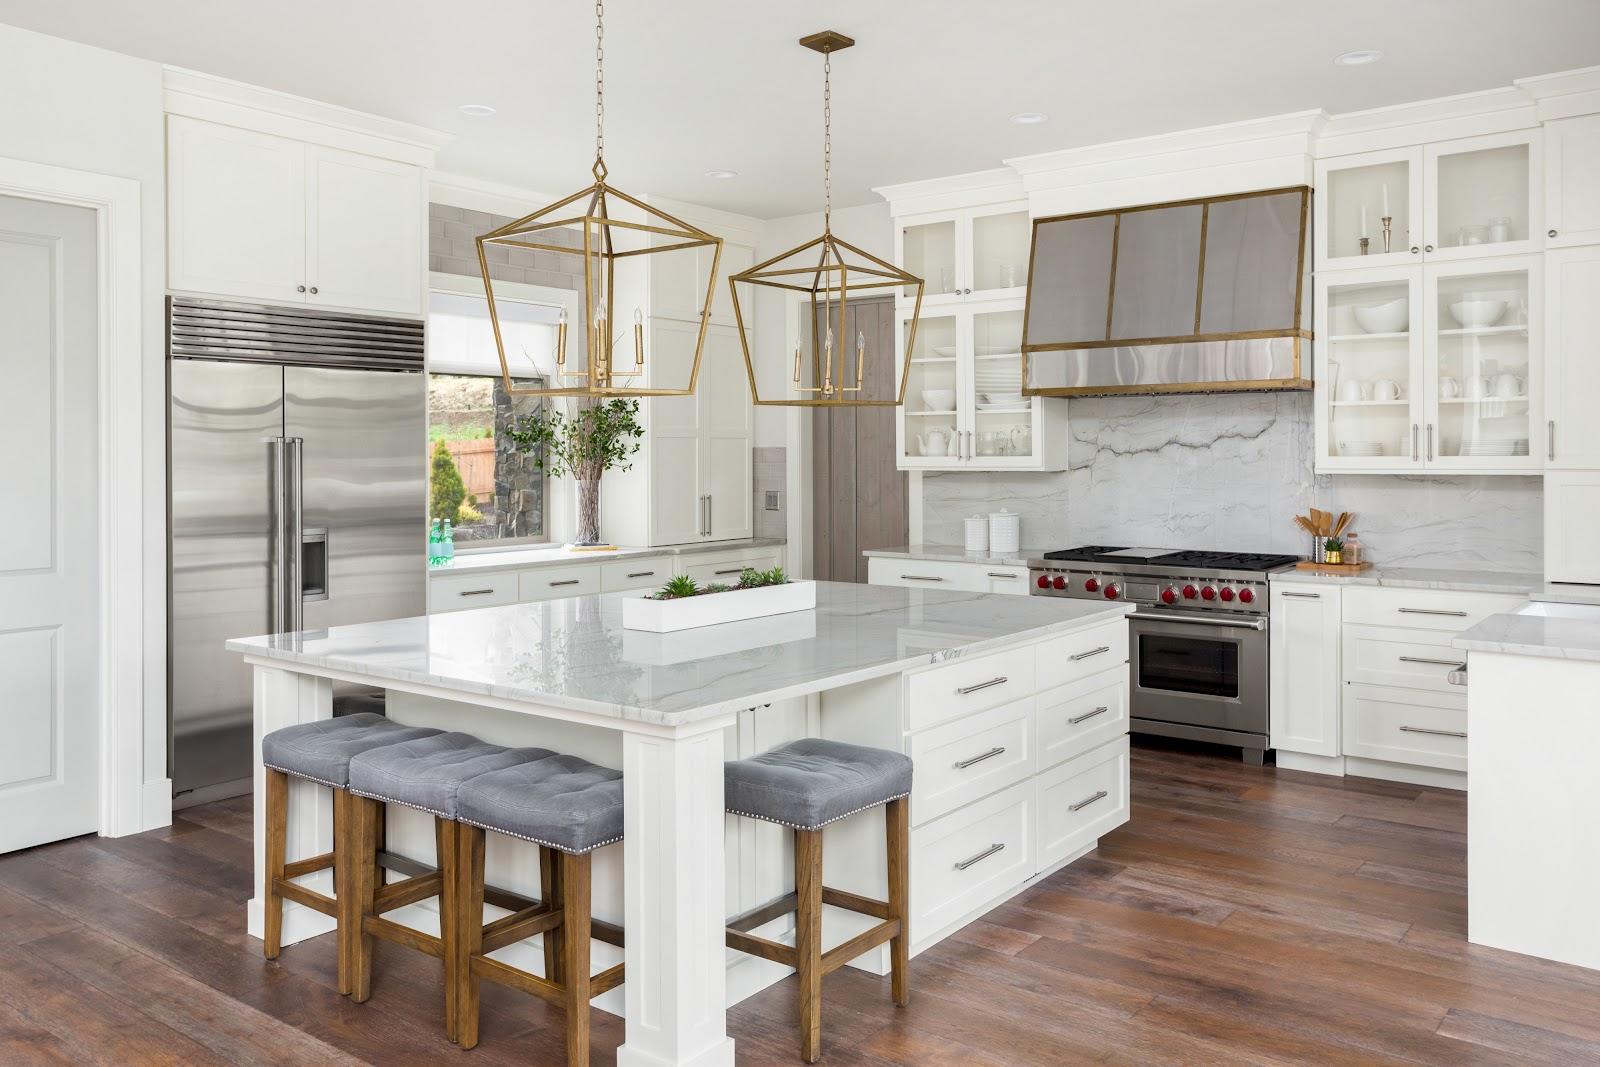 white modern kitchen with bar seating